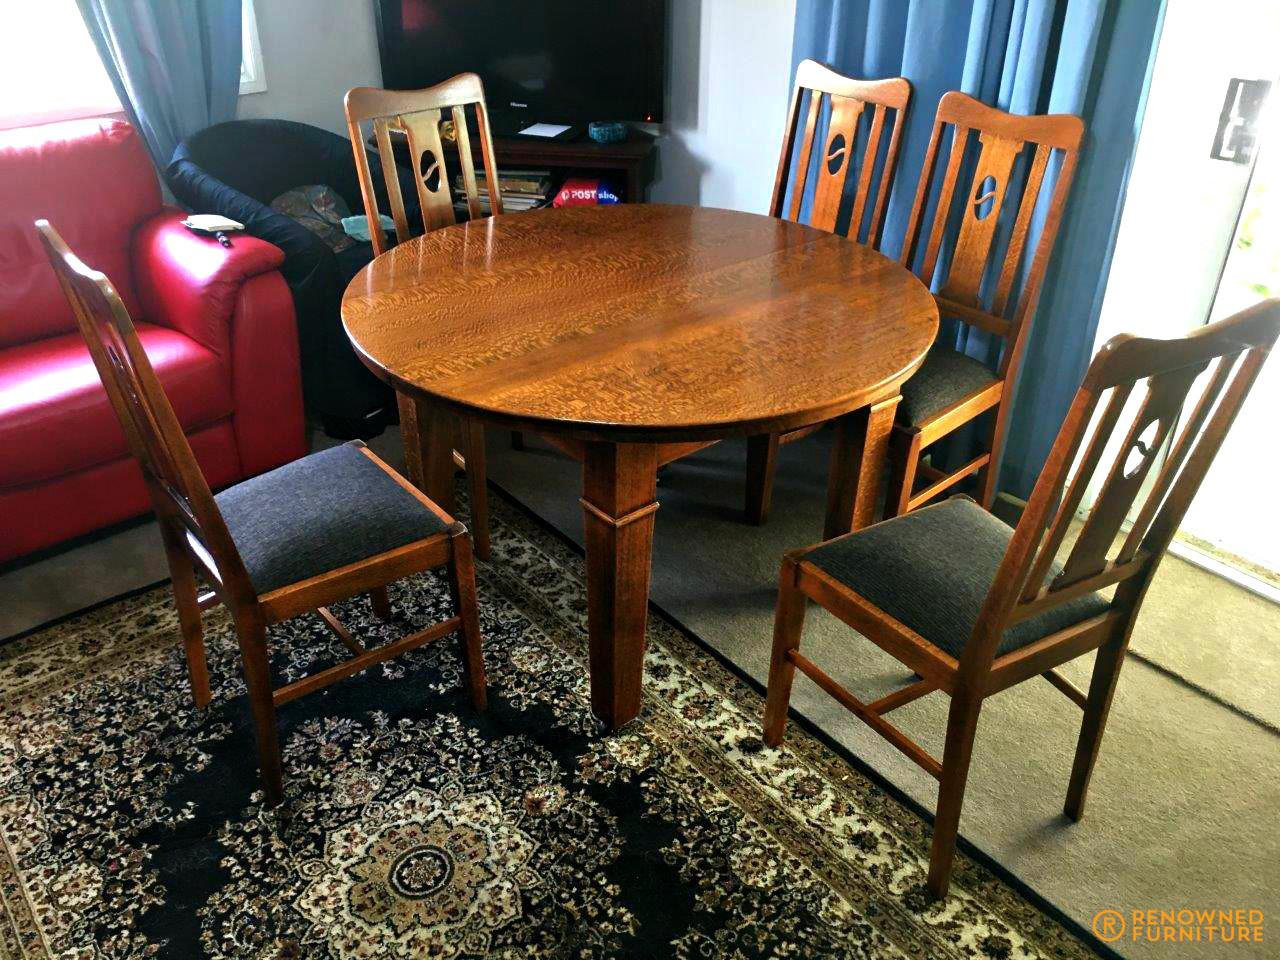 Restored dining suite